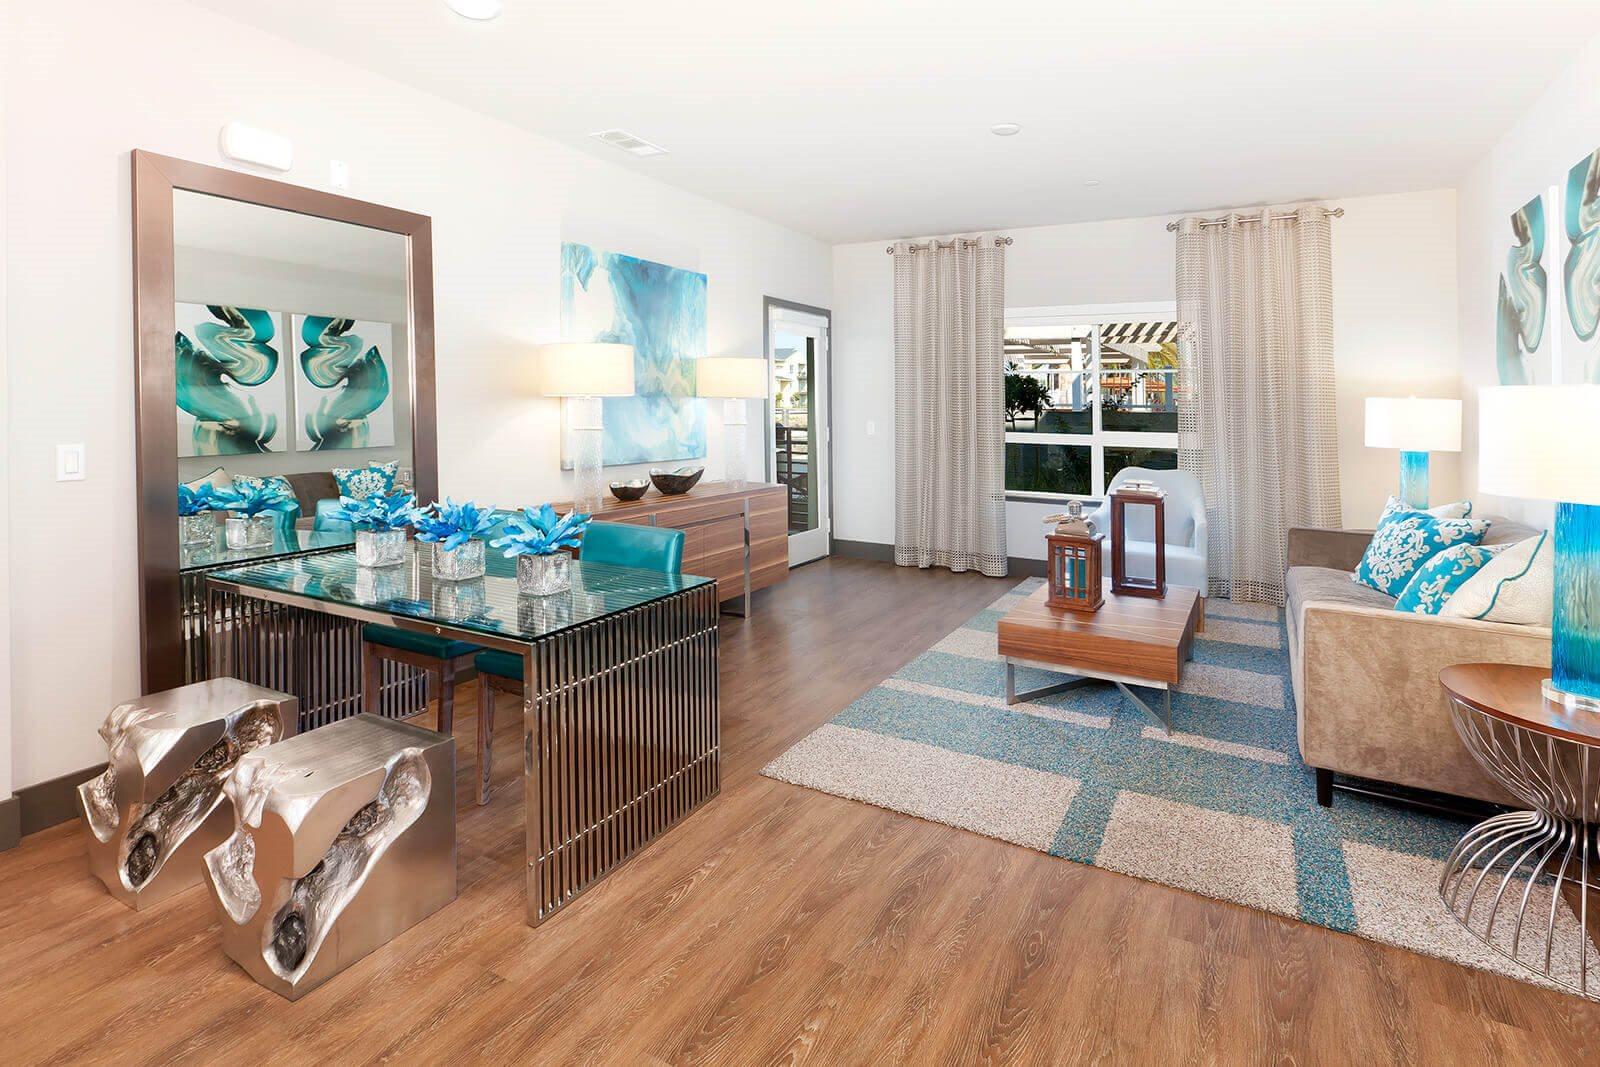 Wood Style Flooring at Blu Harbor by Windsor, CA, 94063